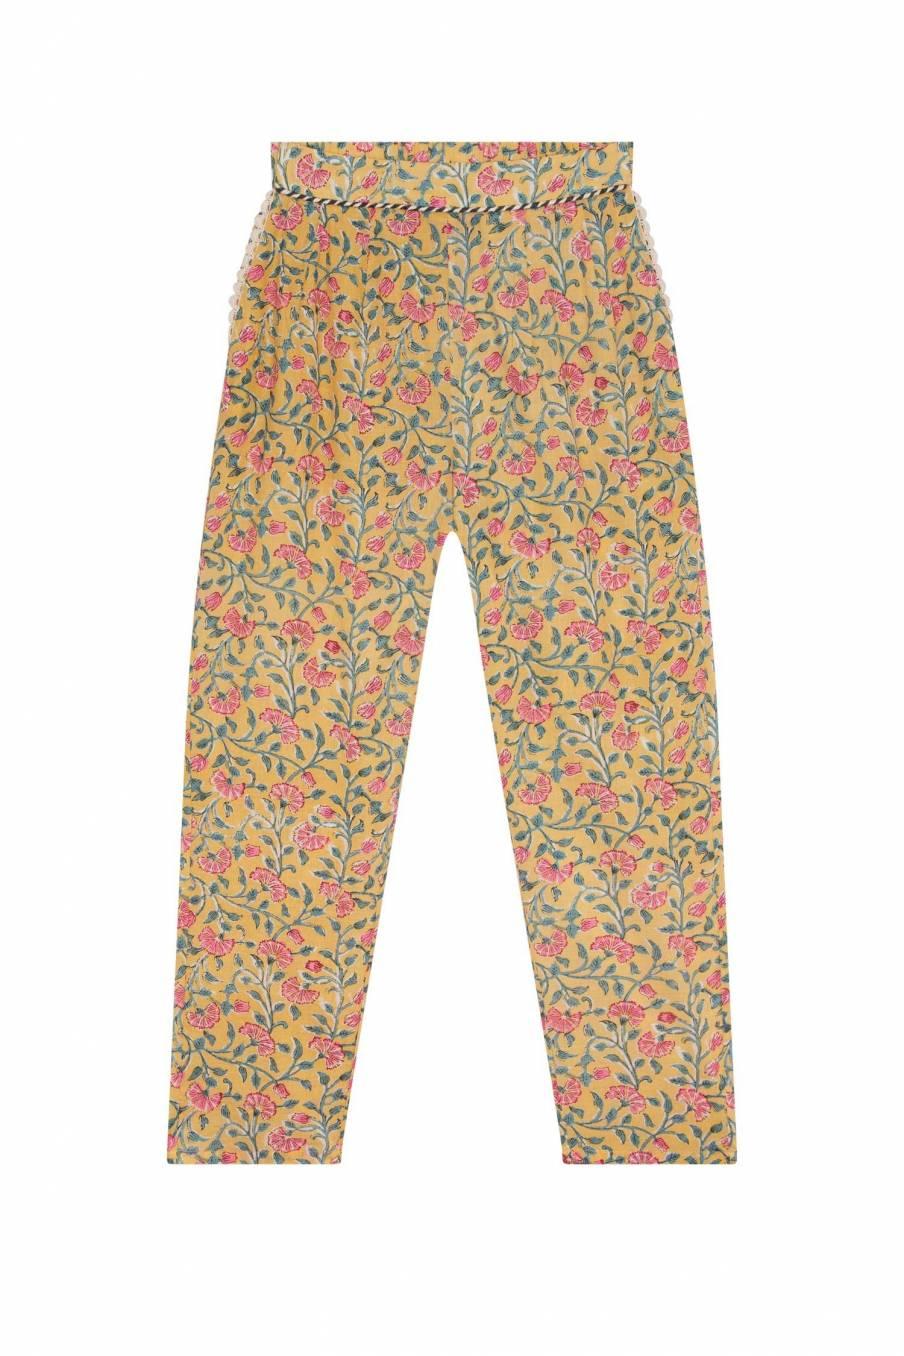 Pants Chama Lemon Flowers